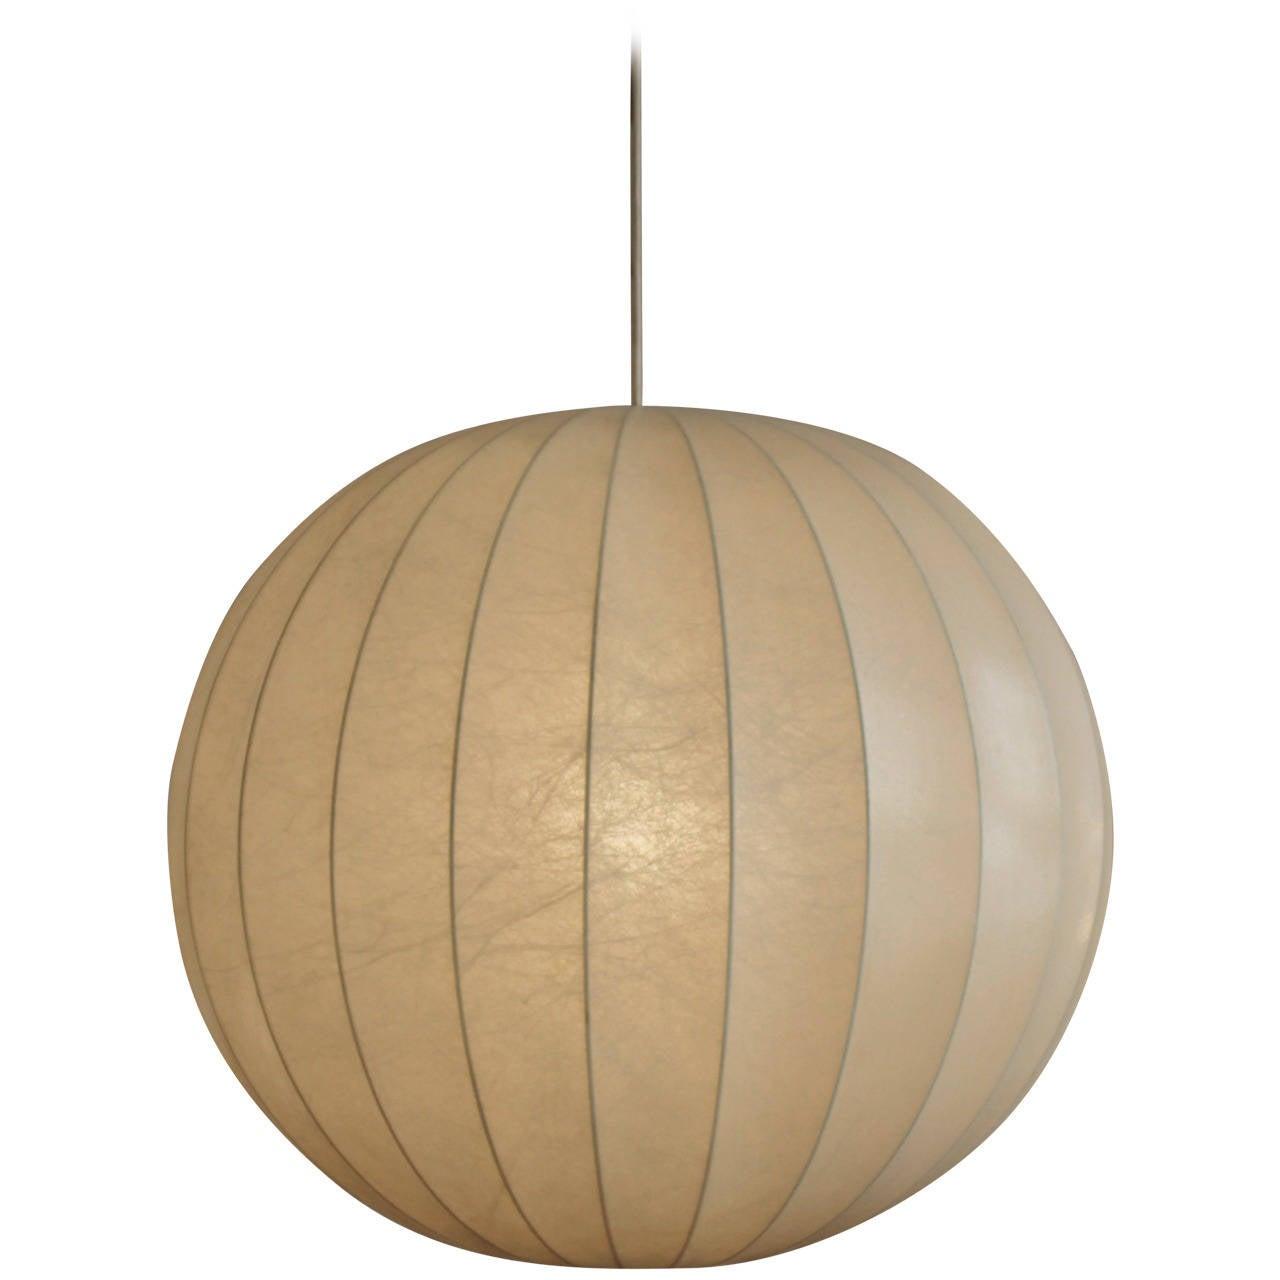 big castiglioni s cocoon sphere pendant l at 1stdibs